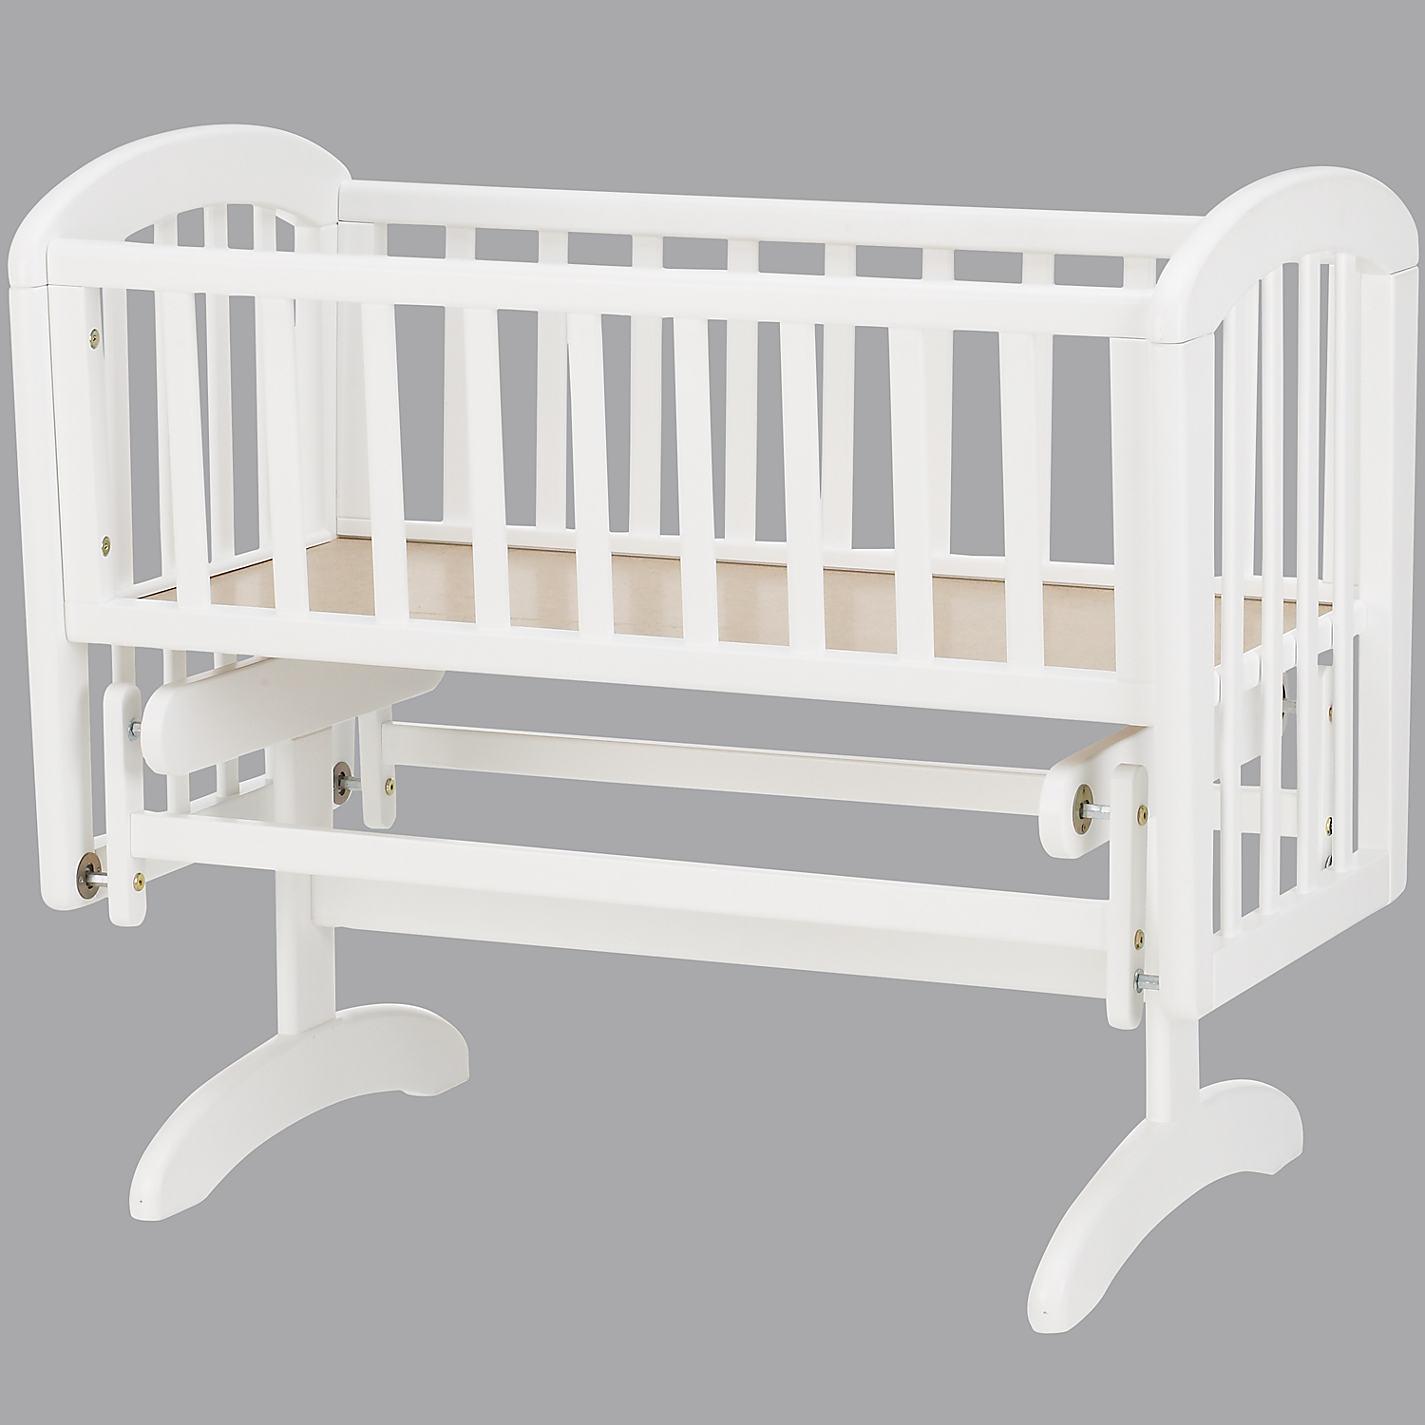 Baby bed john lewis kiddicare_dream_crib_natural_a_ss_1 sleeping options baby crib